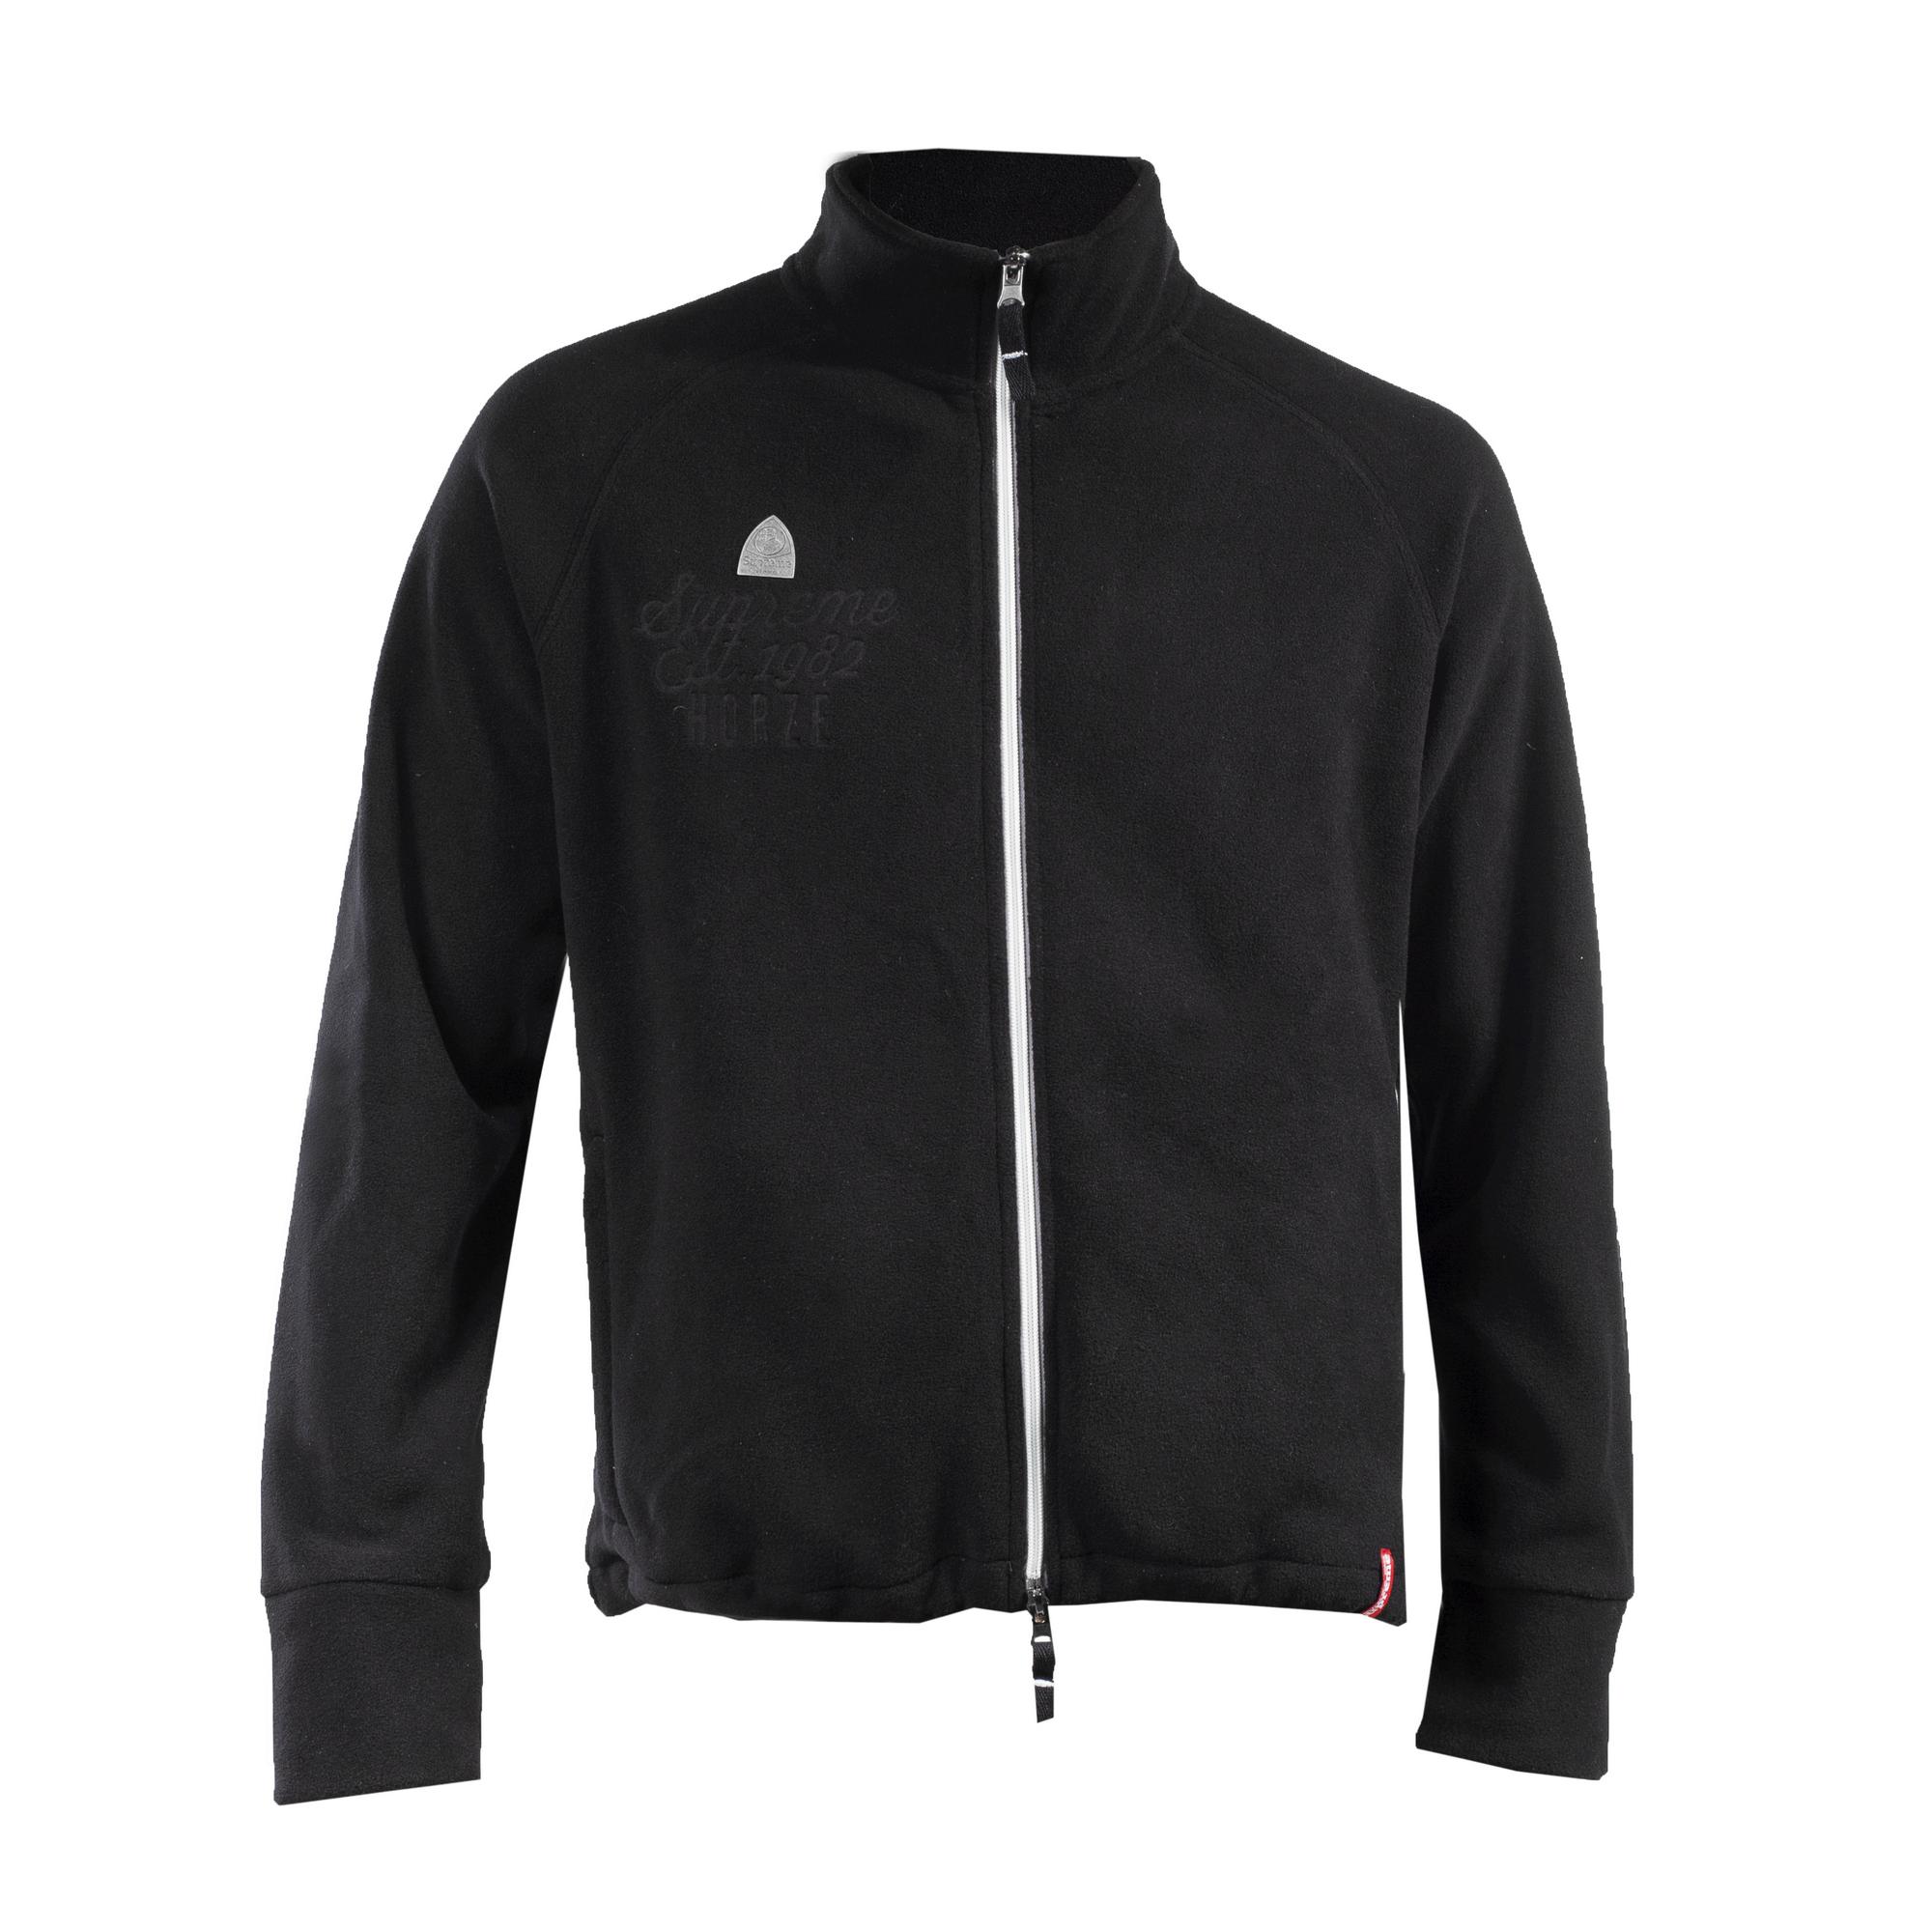 Horze Supreme Langston Unisex Fleece Jacket